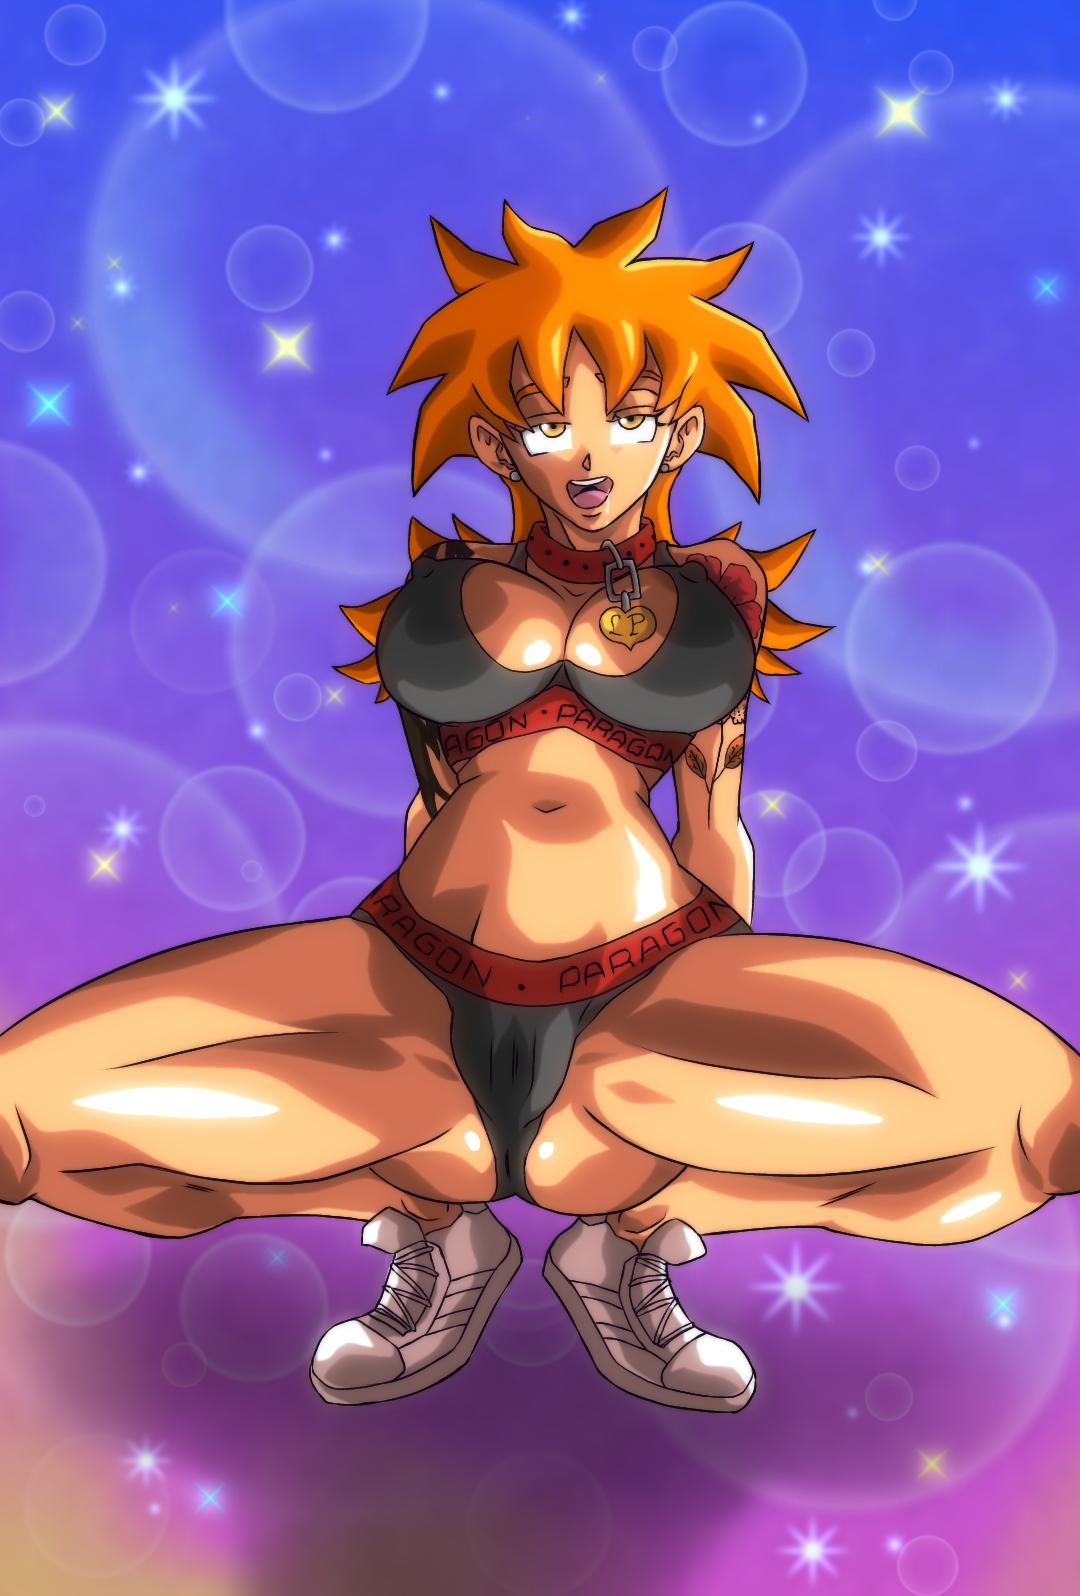 SoritaNsfw Earns Her New Pride Coc Appeasing armor